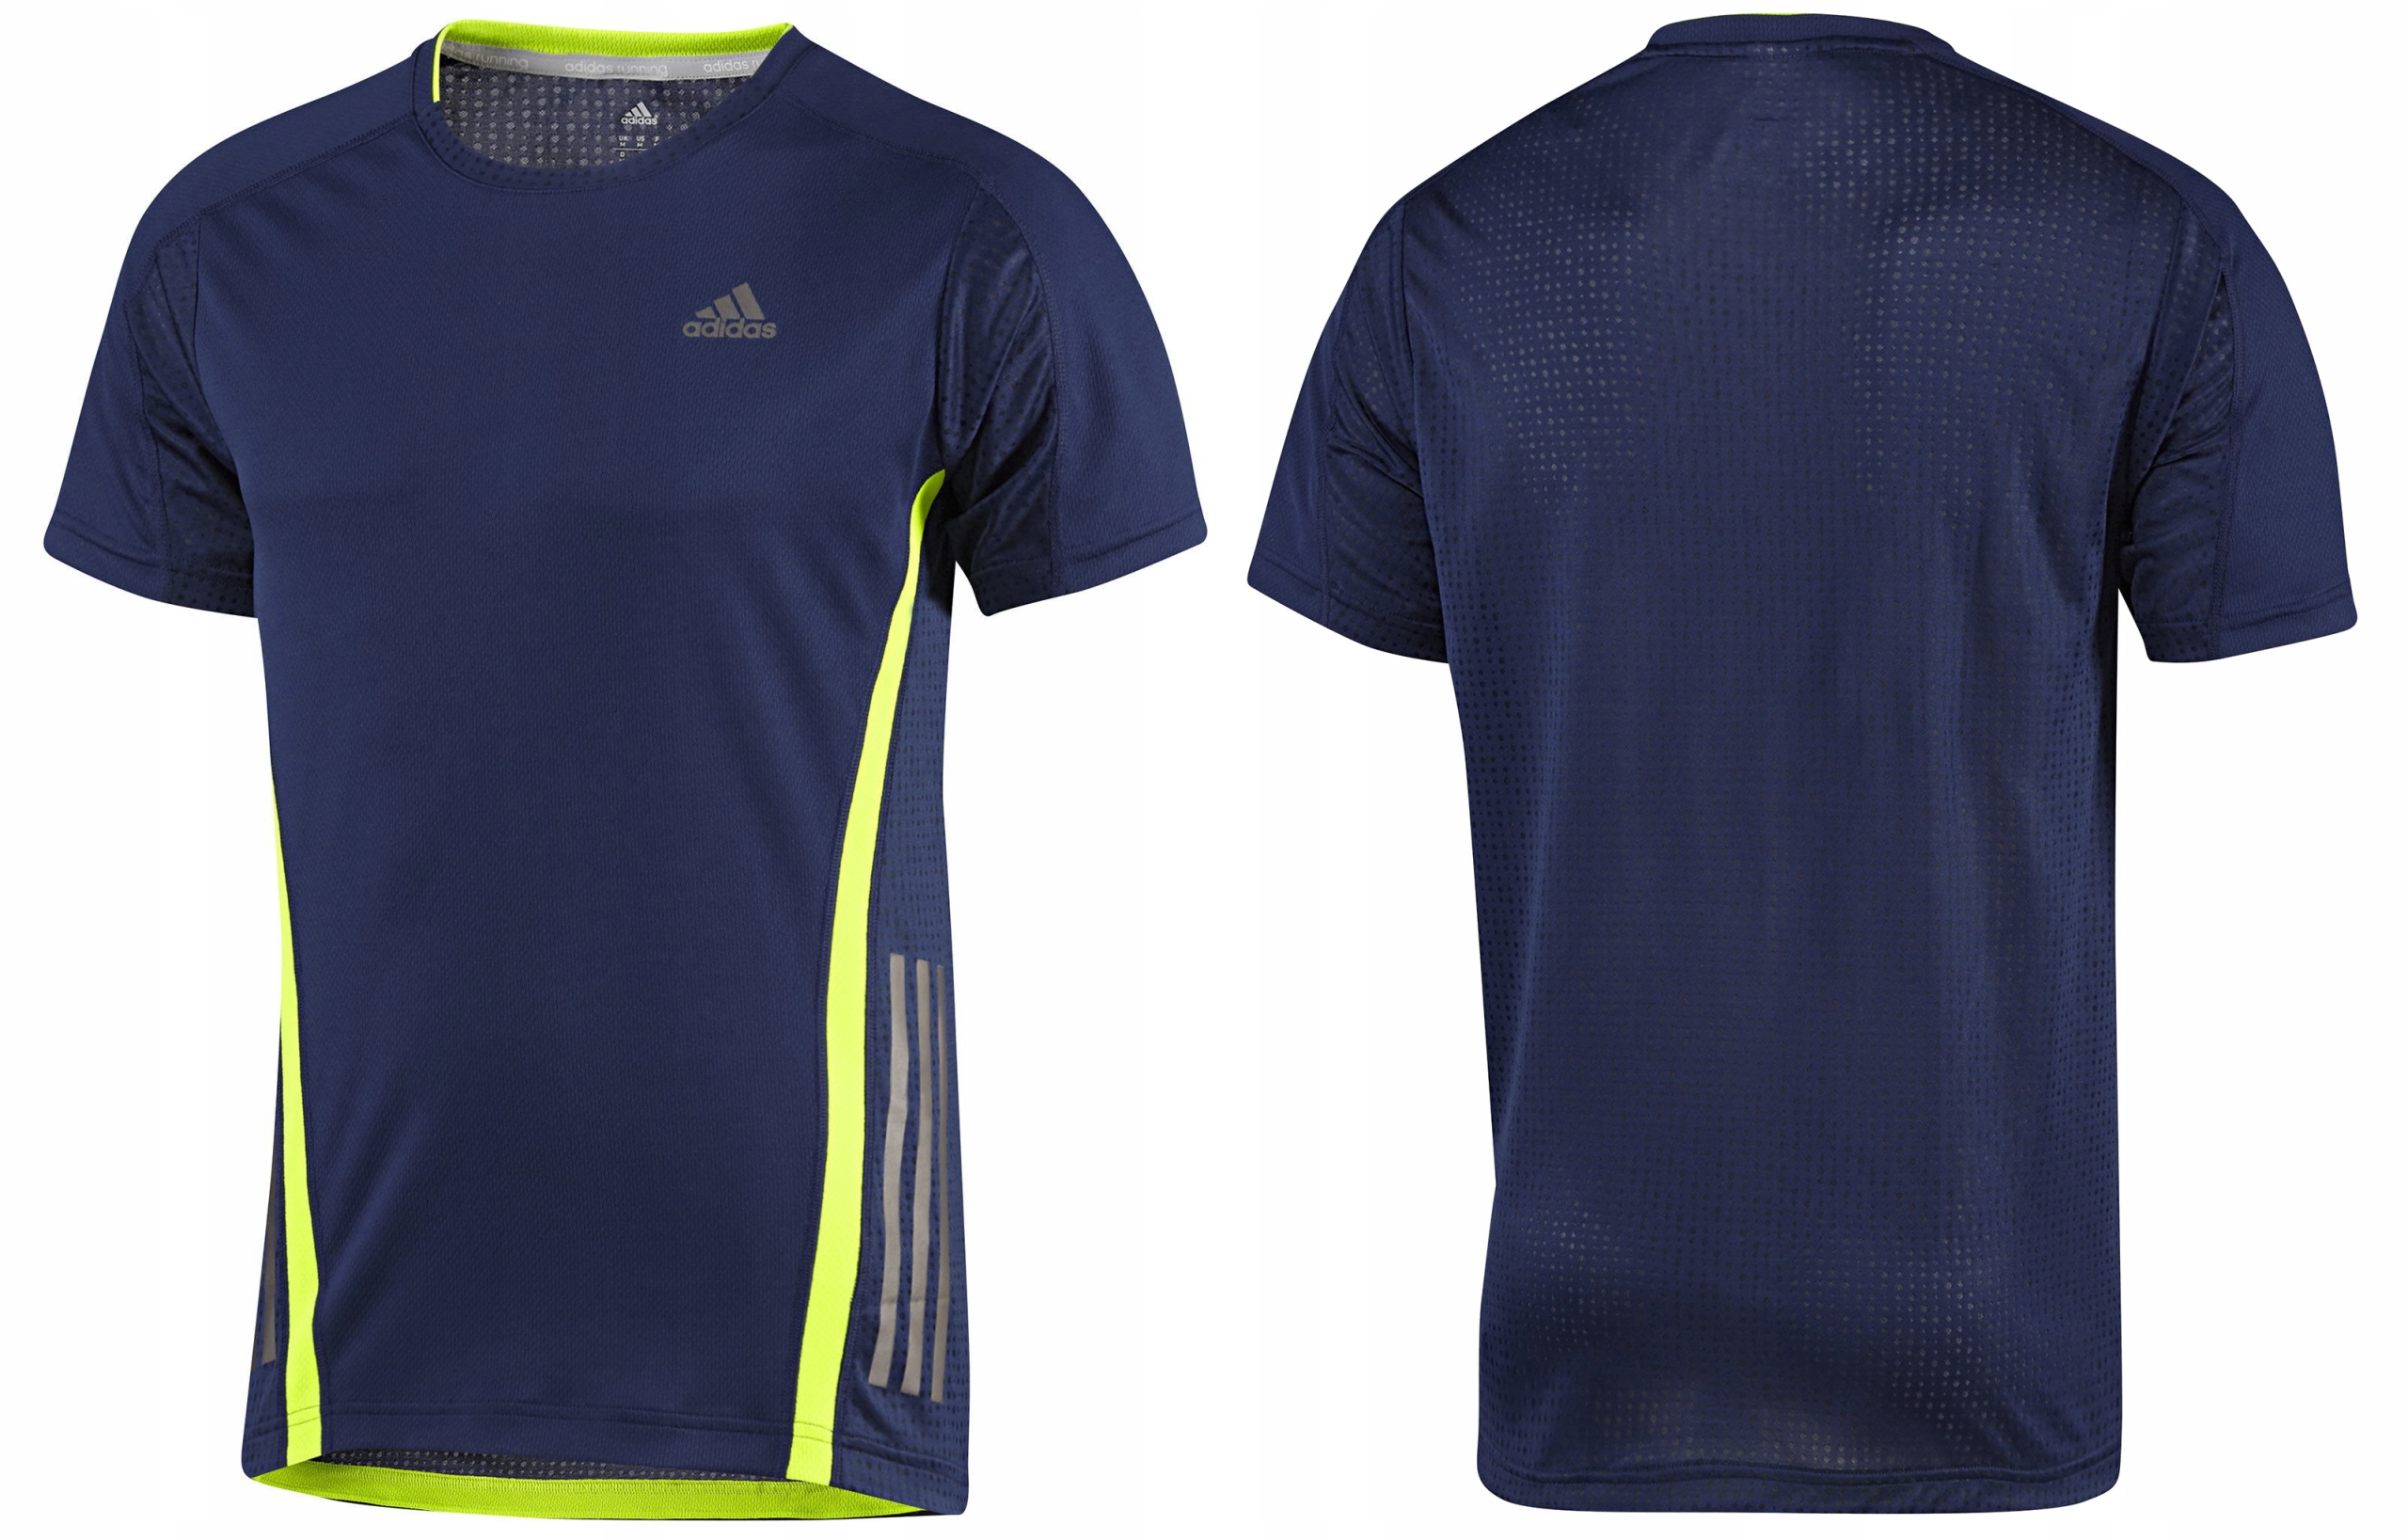 Adidas SN ClimaCool koszulka biegowa męska - M/L